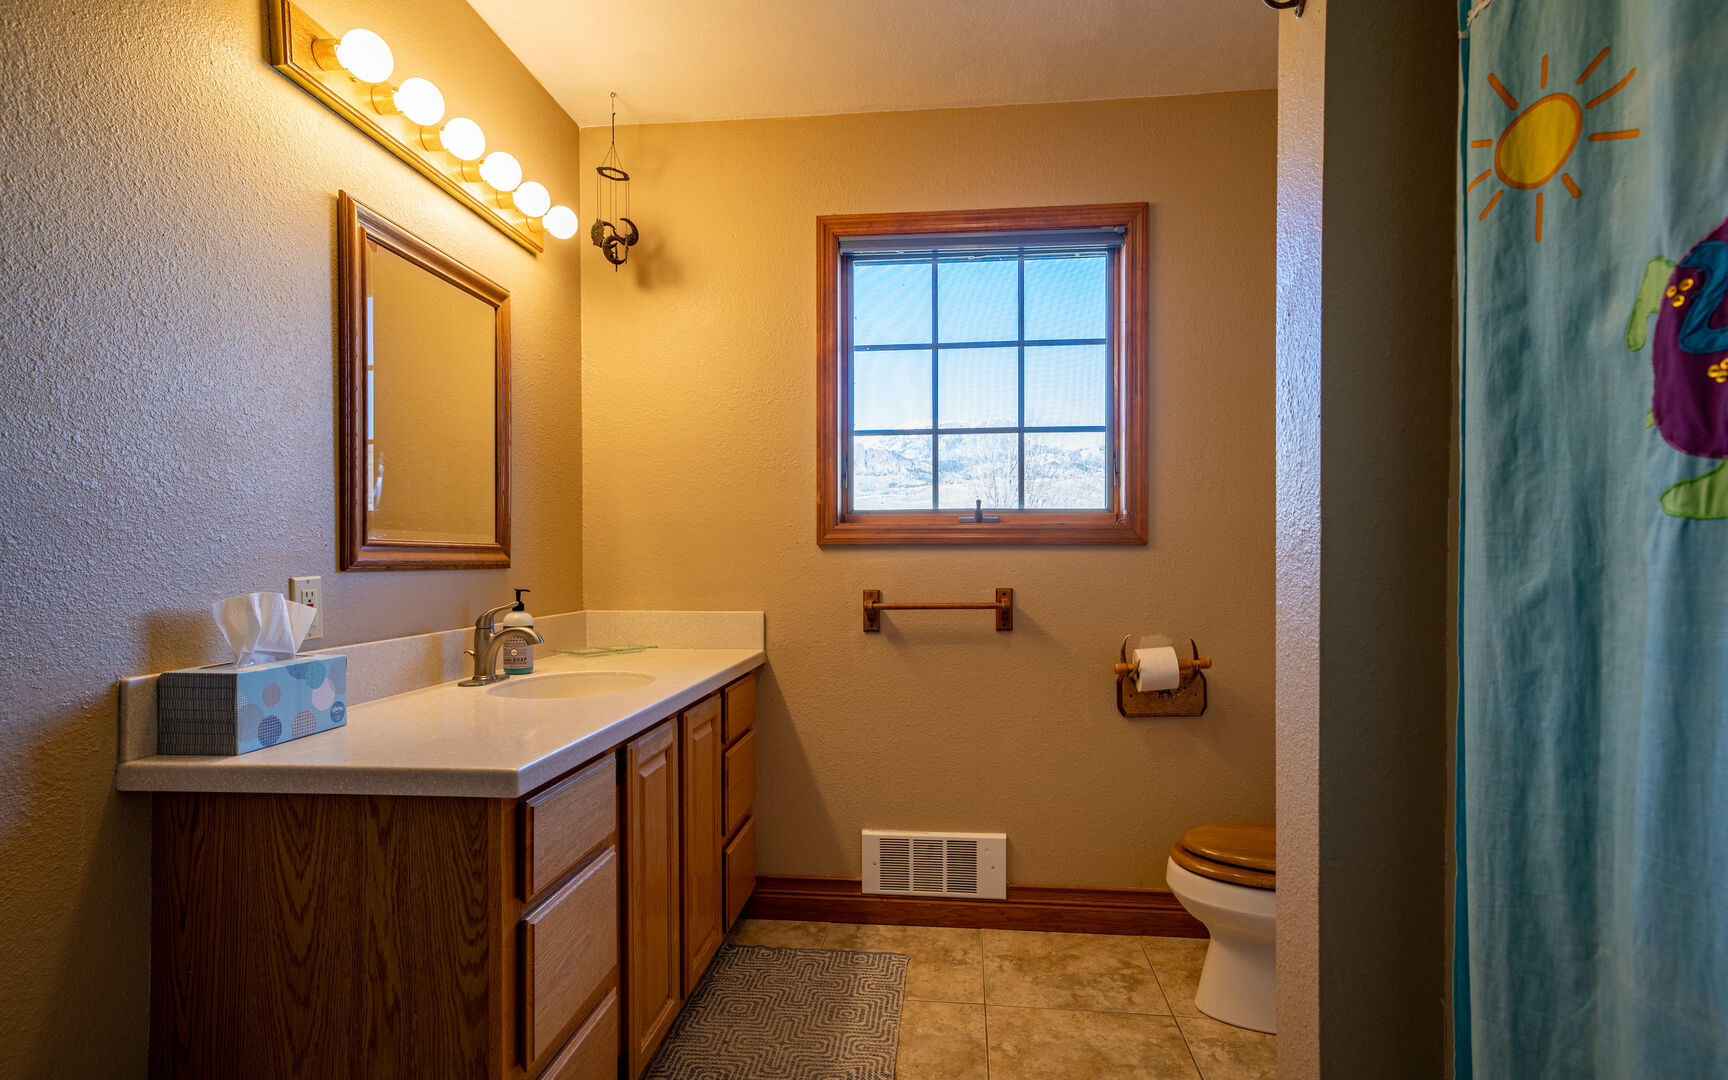 Bathroom 2 (Main Level)